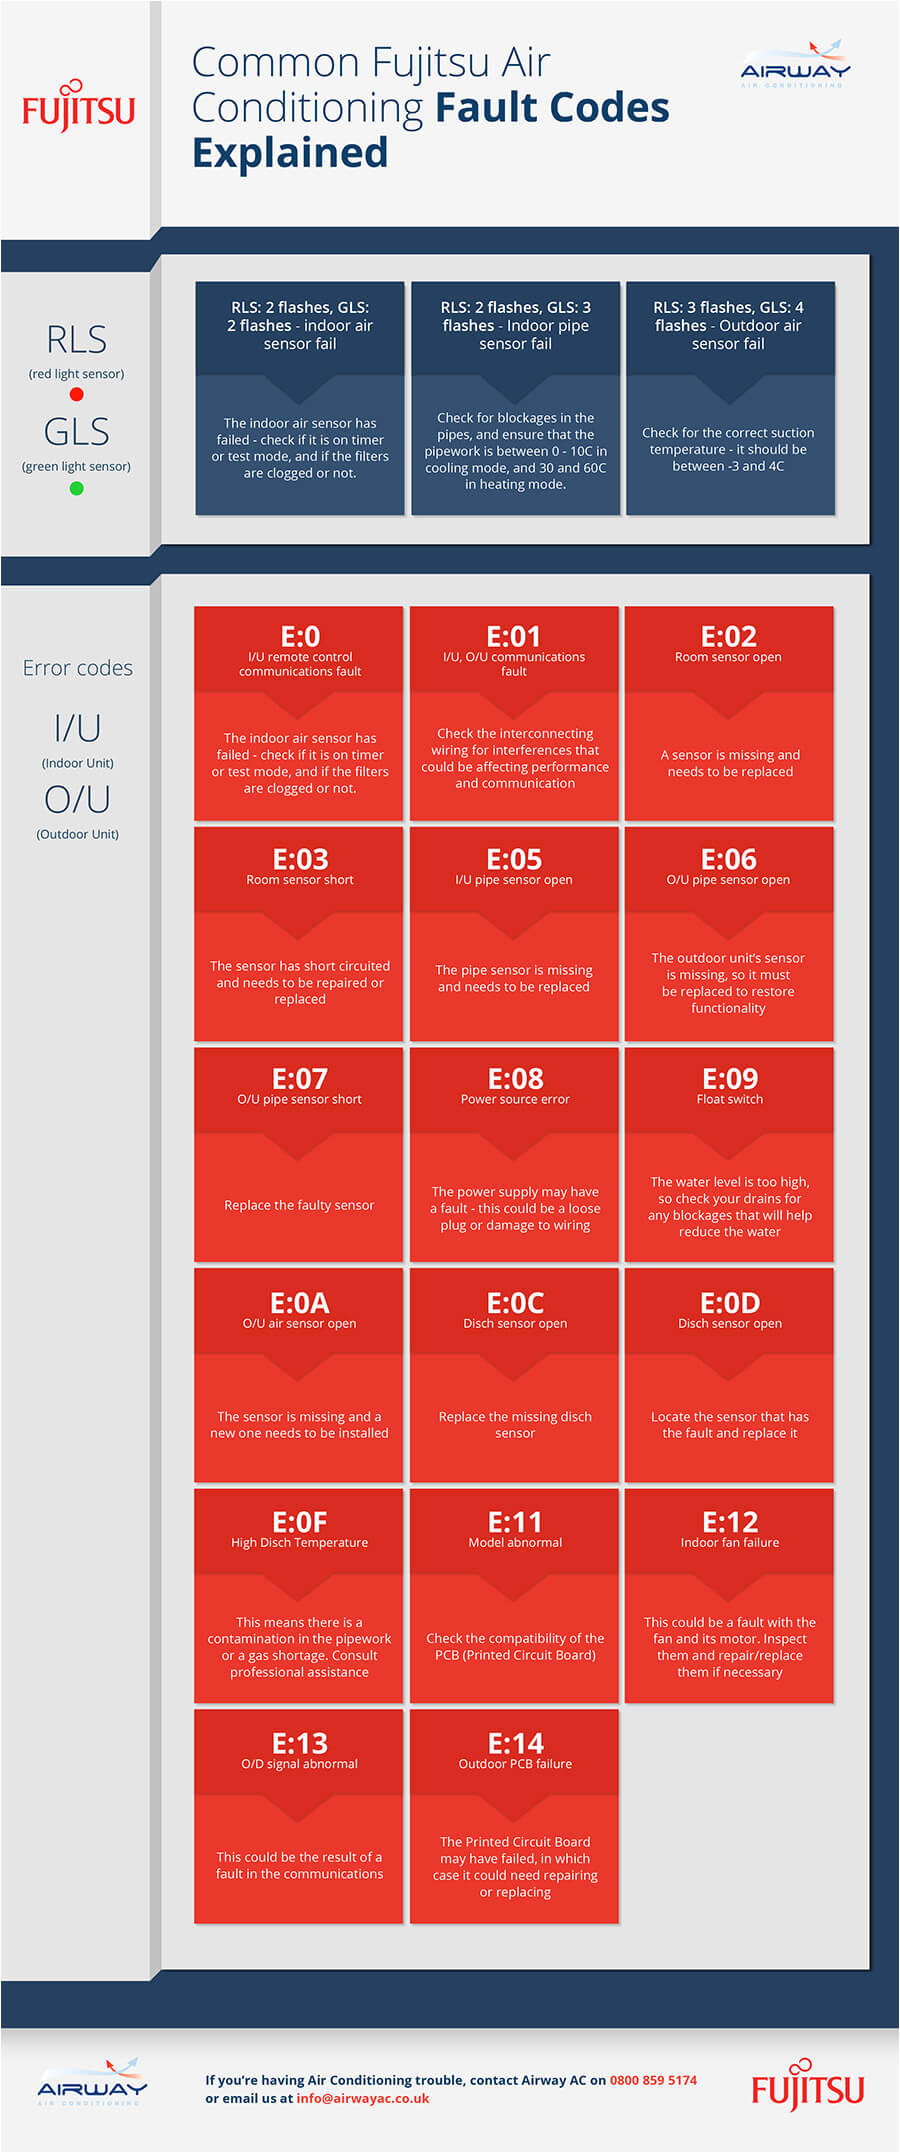 Fujitsu Halcyon Error Codes Fujitsu Air Conditioning Fault Codes Explained Infographic Airway